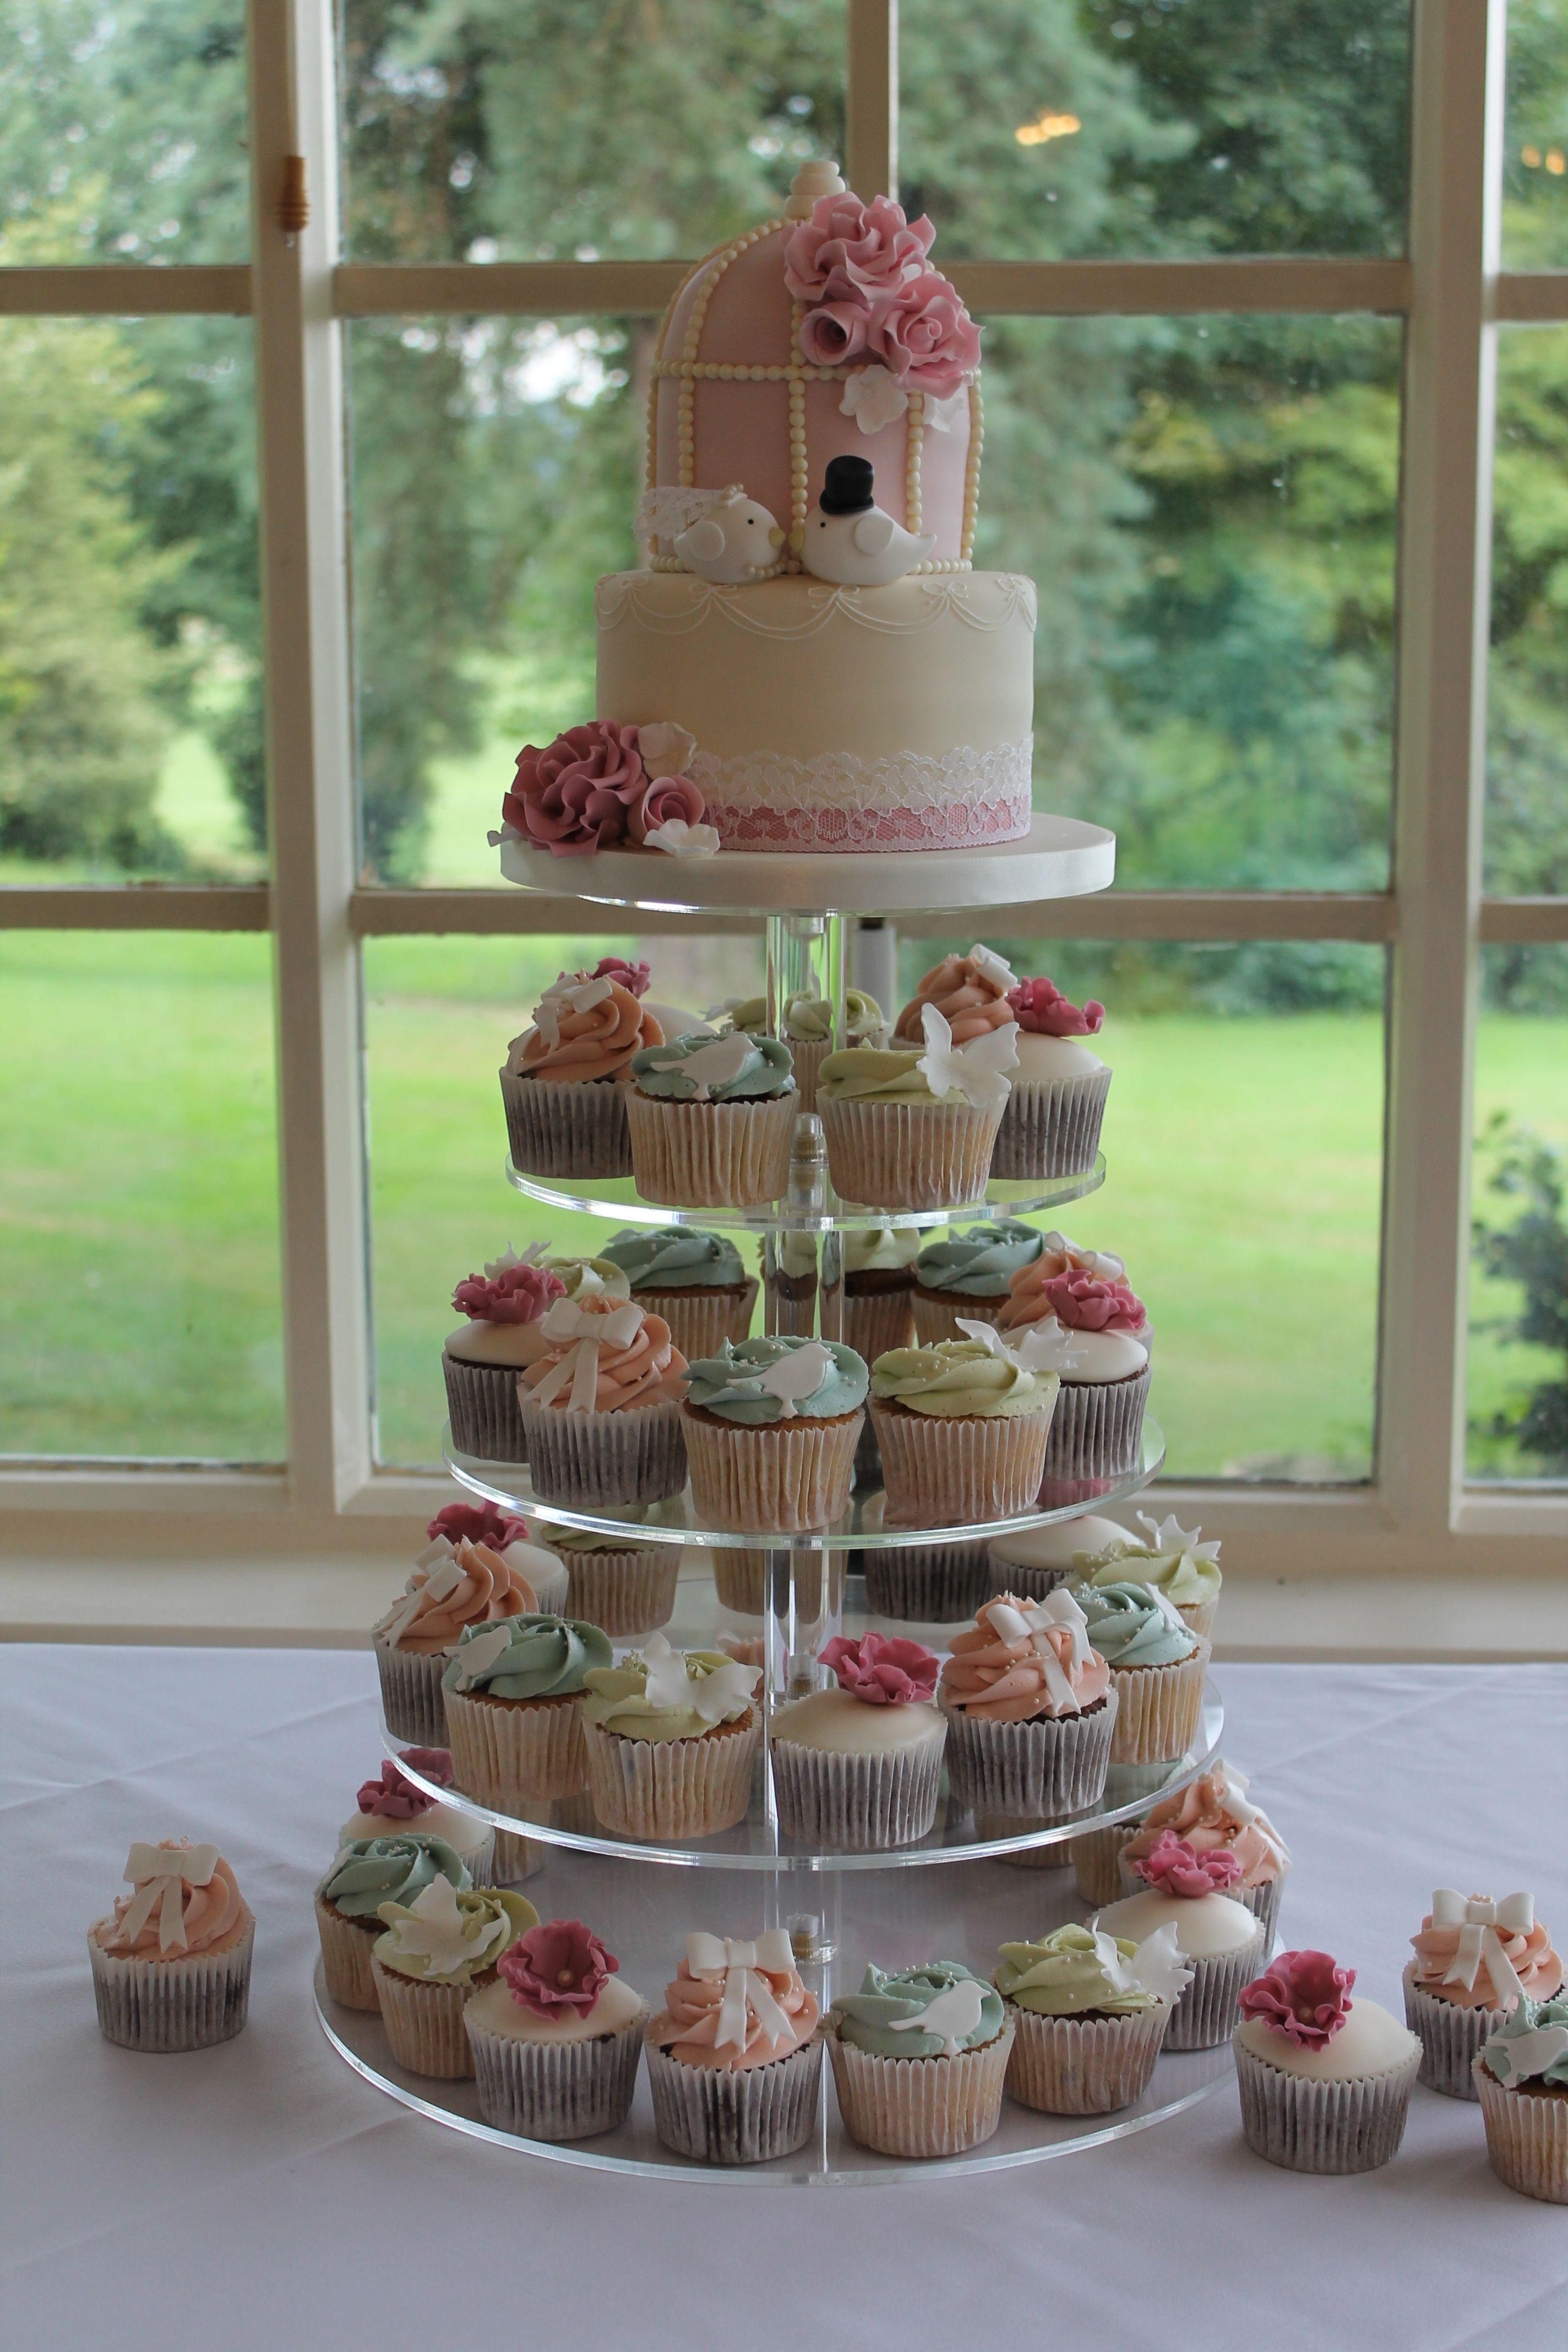 Birdcage wedding cake with love bird bride and groom